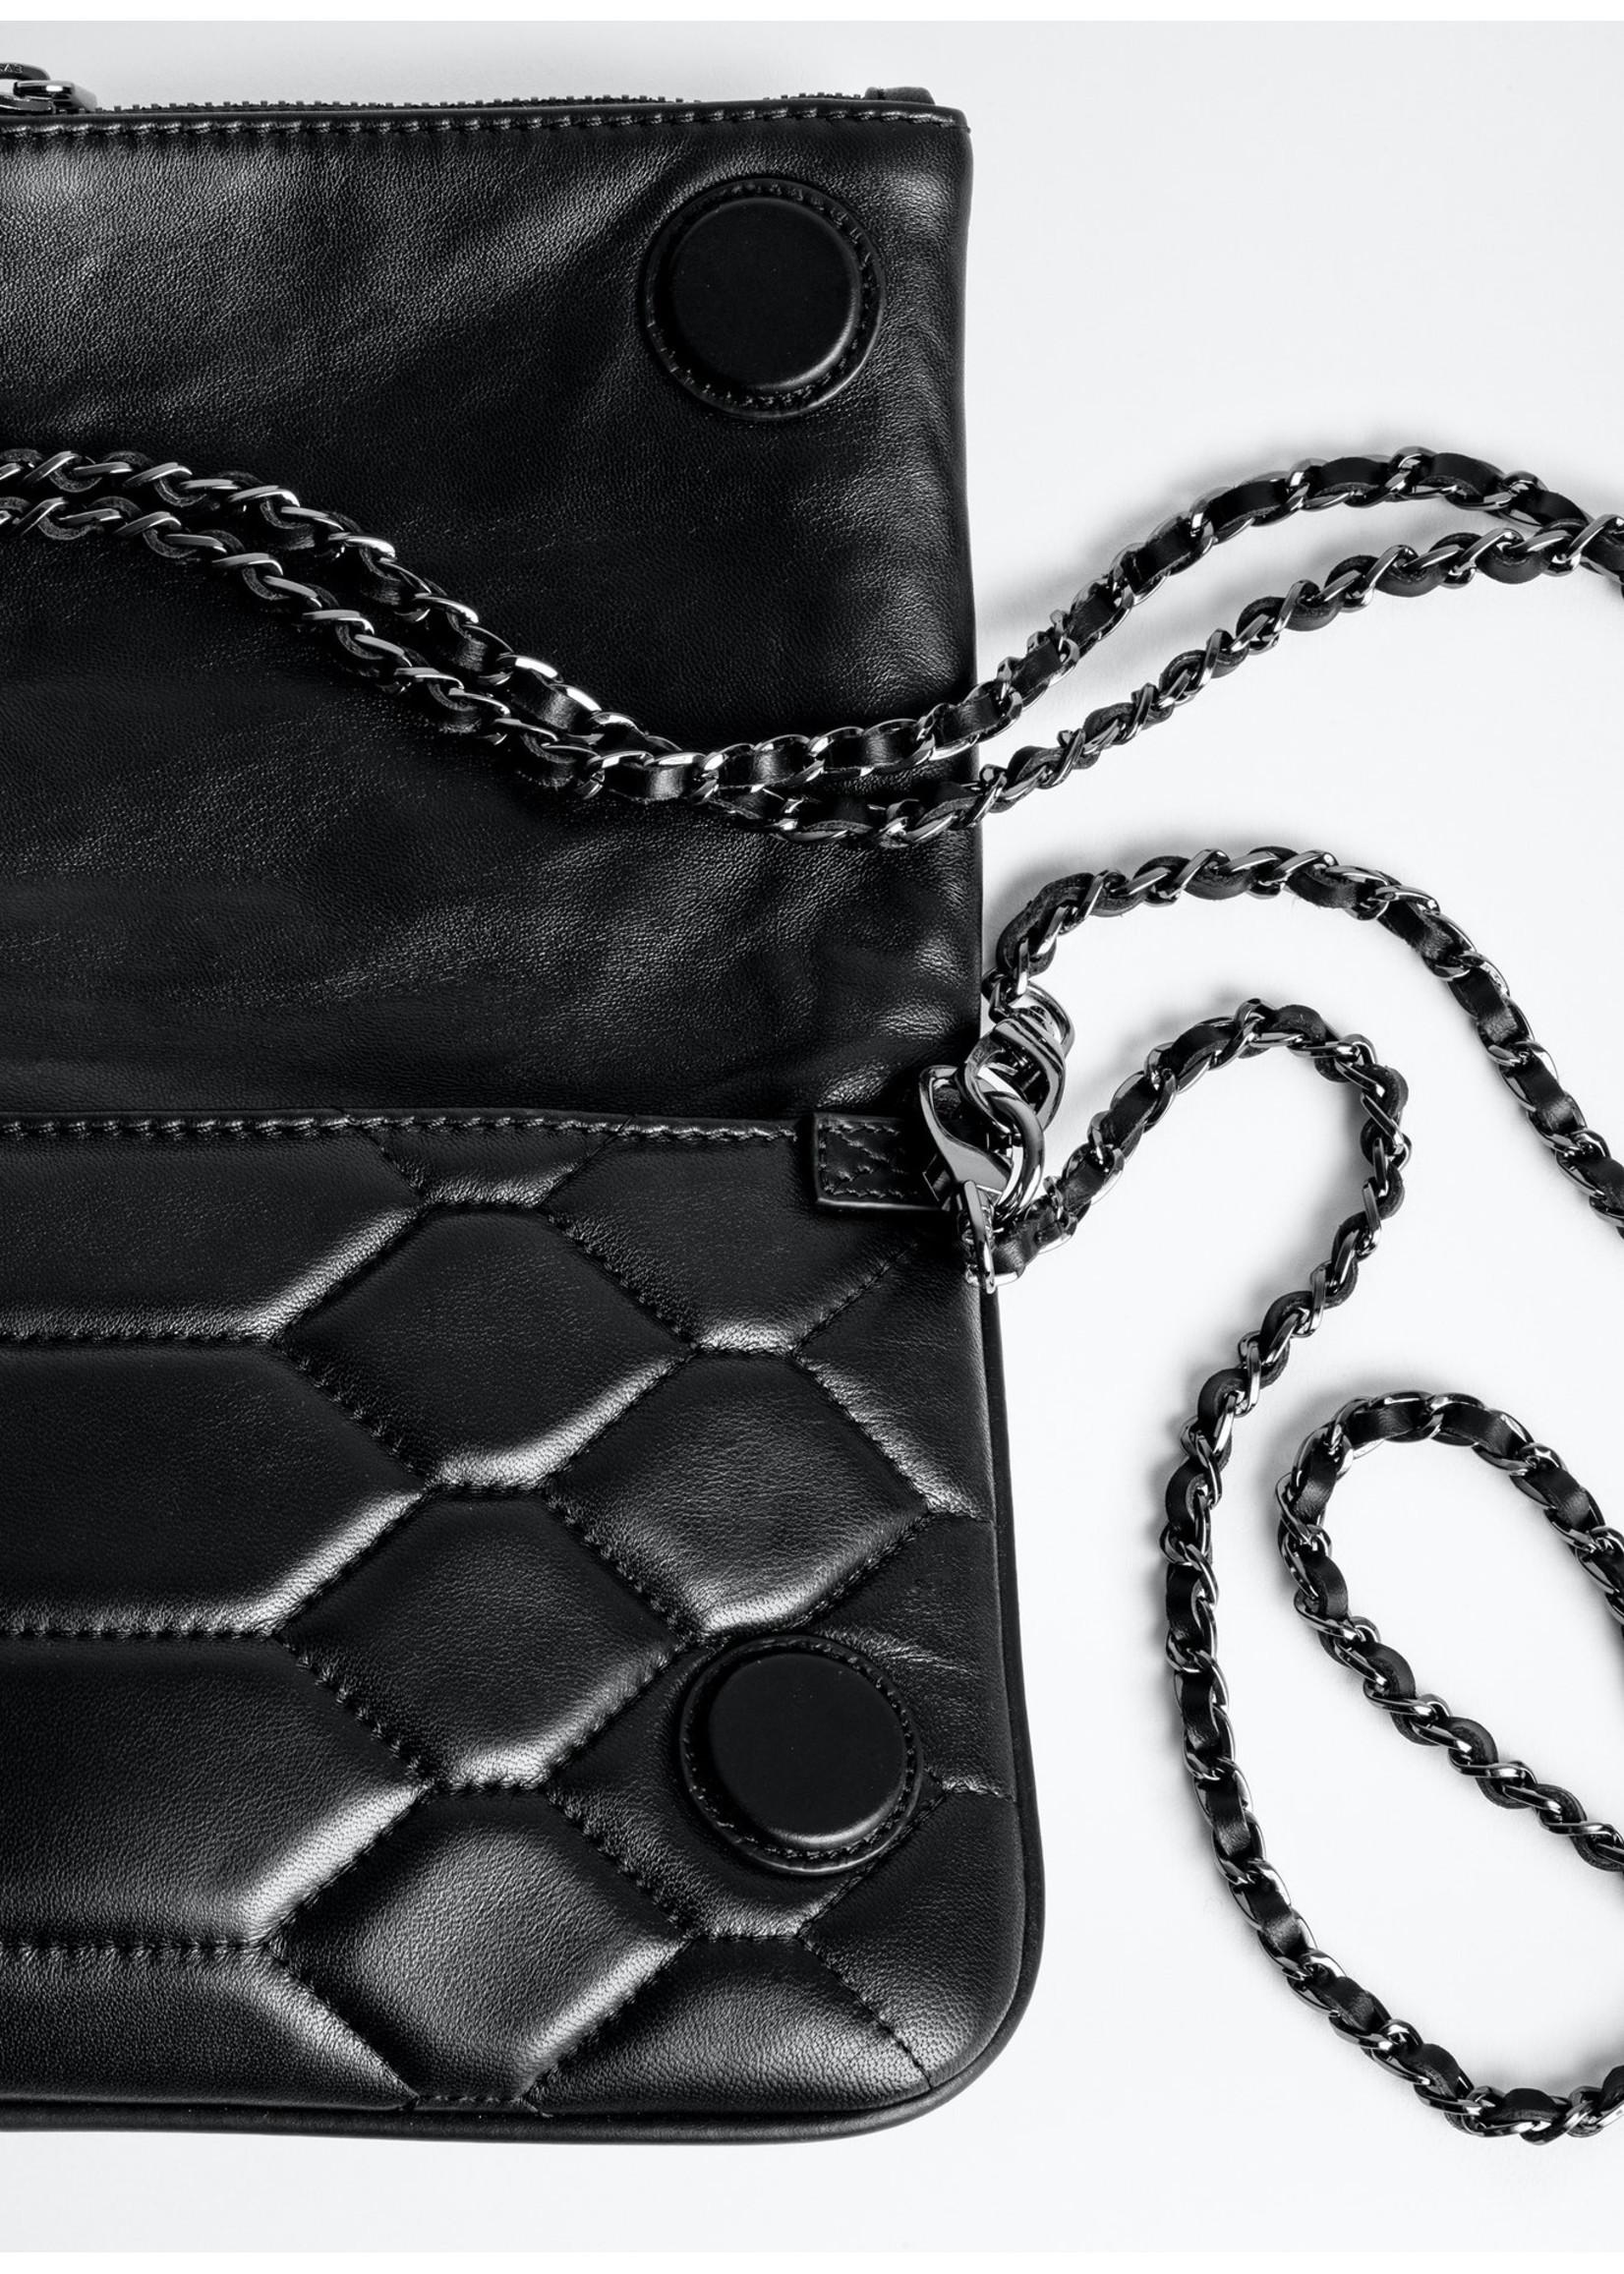 Zadig & Voltaire Rock XL mat sca black